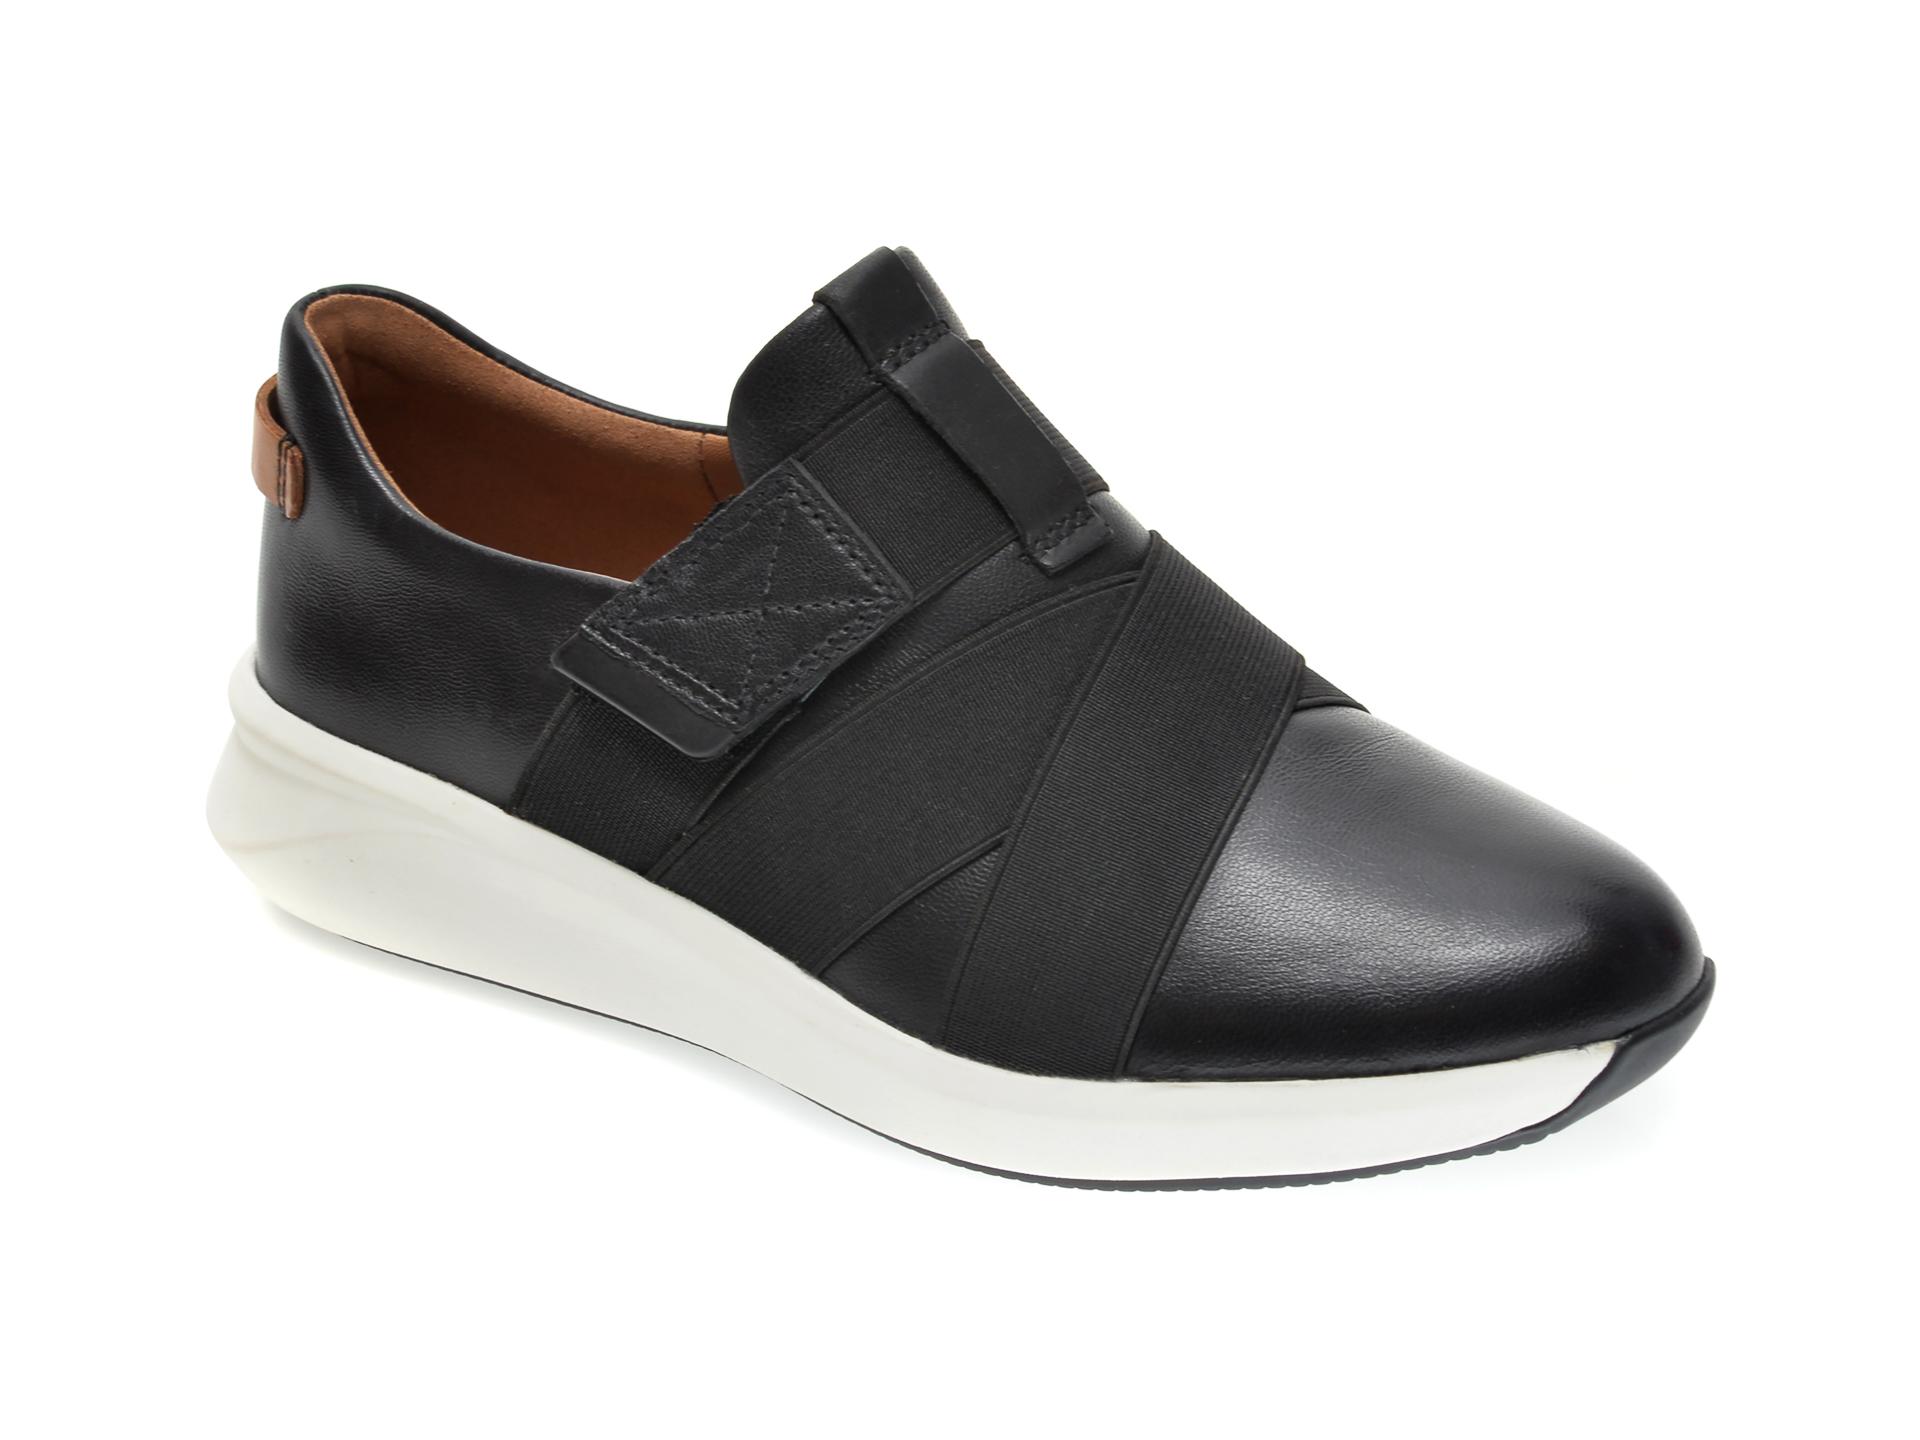 Pantofi CLARKS negri, UN RIO STRAP, din material textil si piele naturala imagine